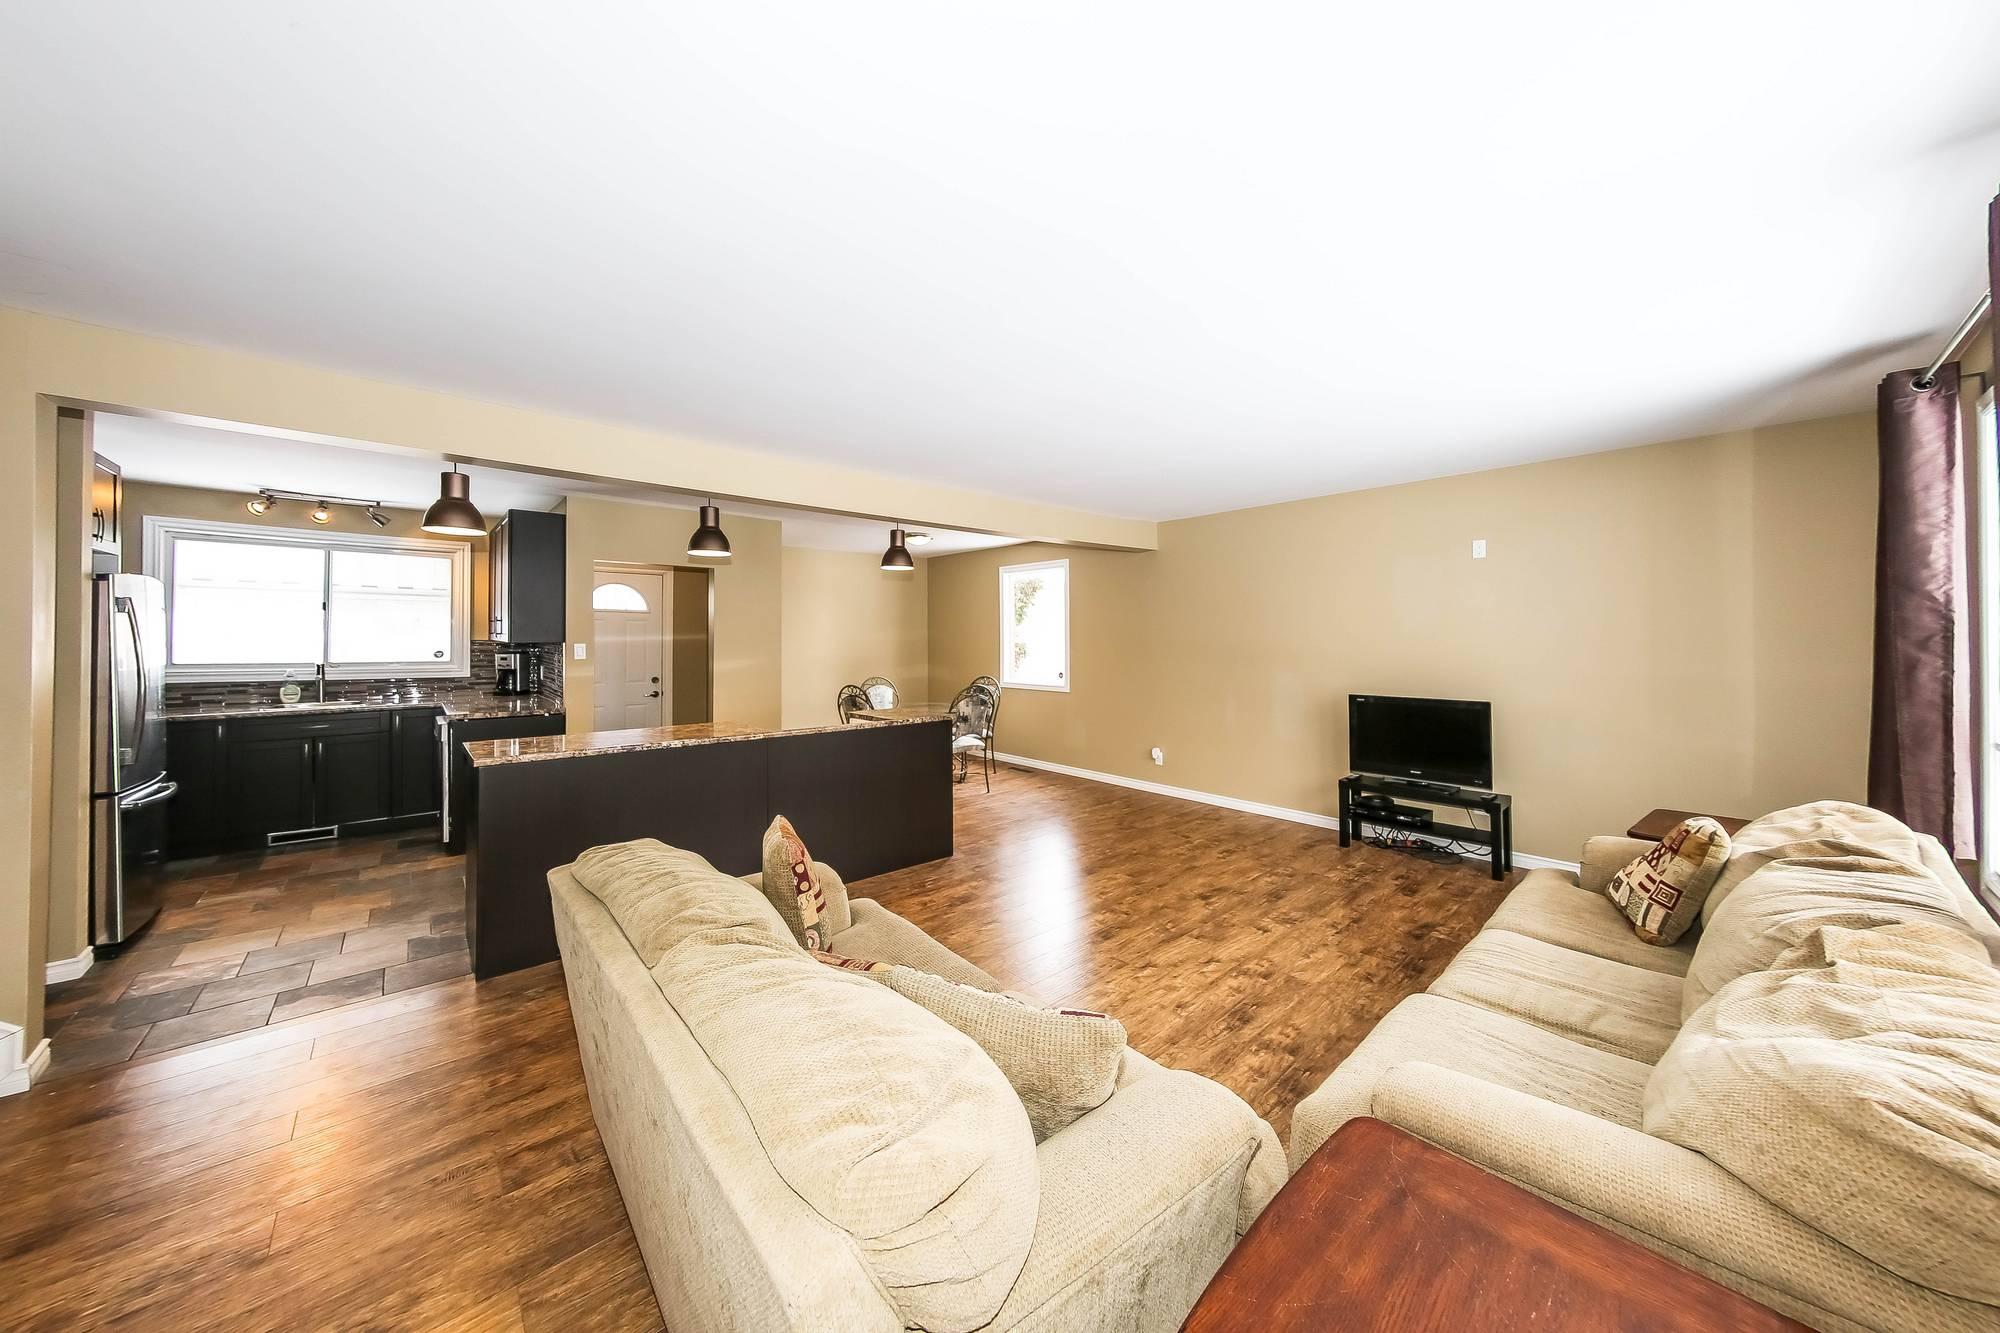 158 Raquette, Winnipeg, Manitoba  R3K 1N5 - Photo 2 - 202002520